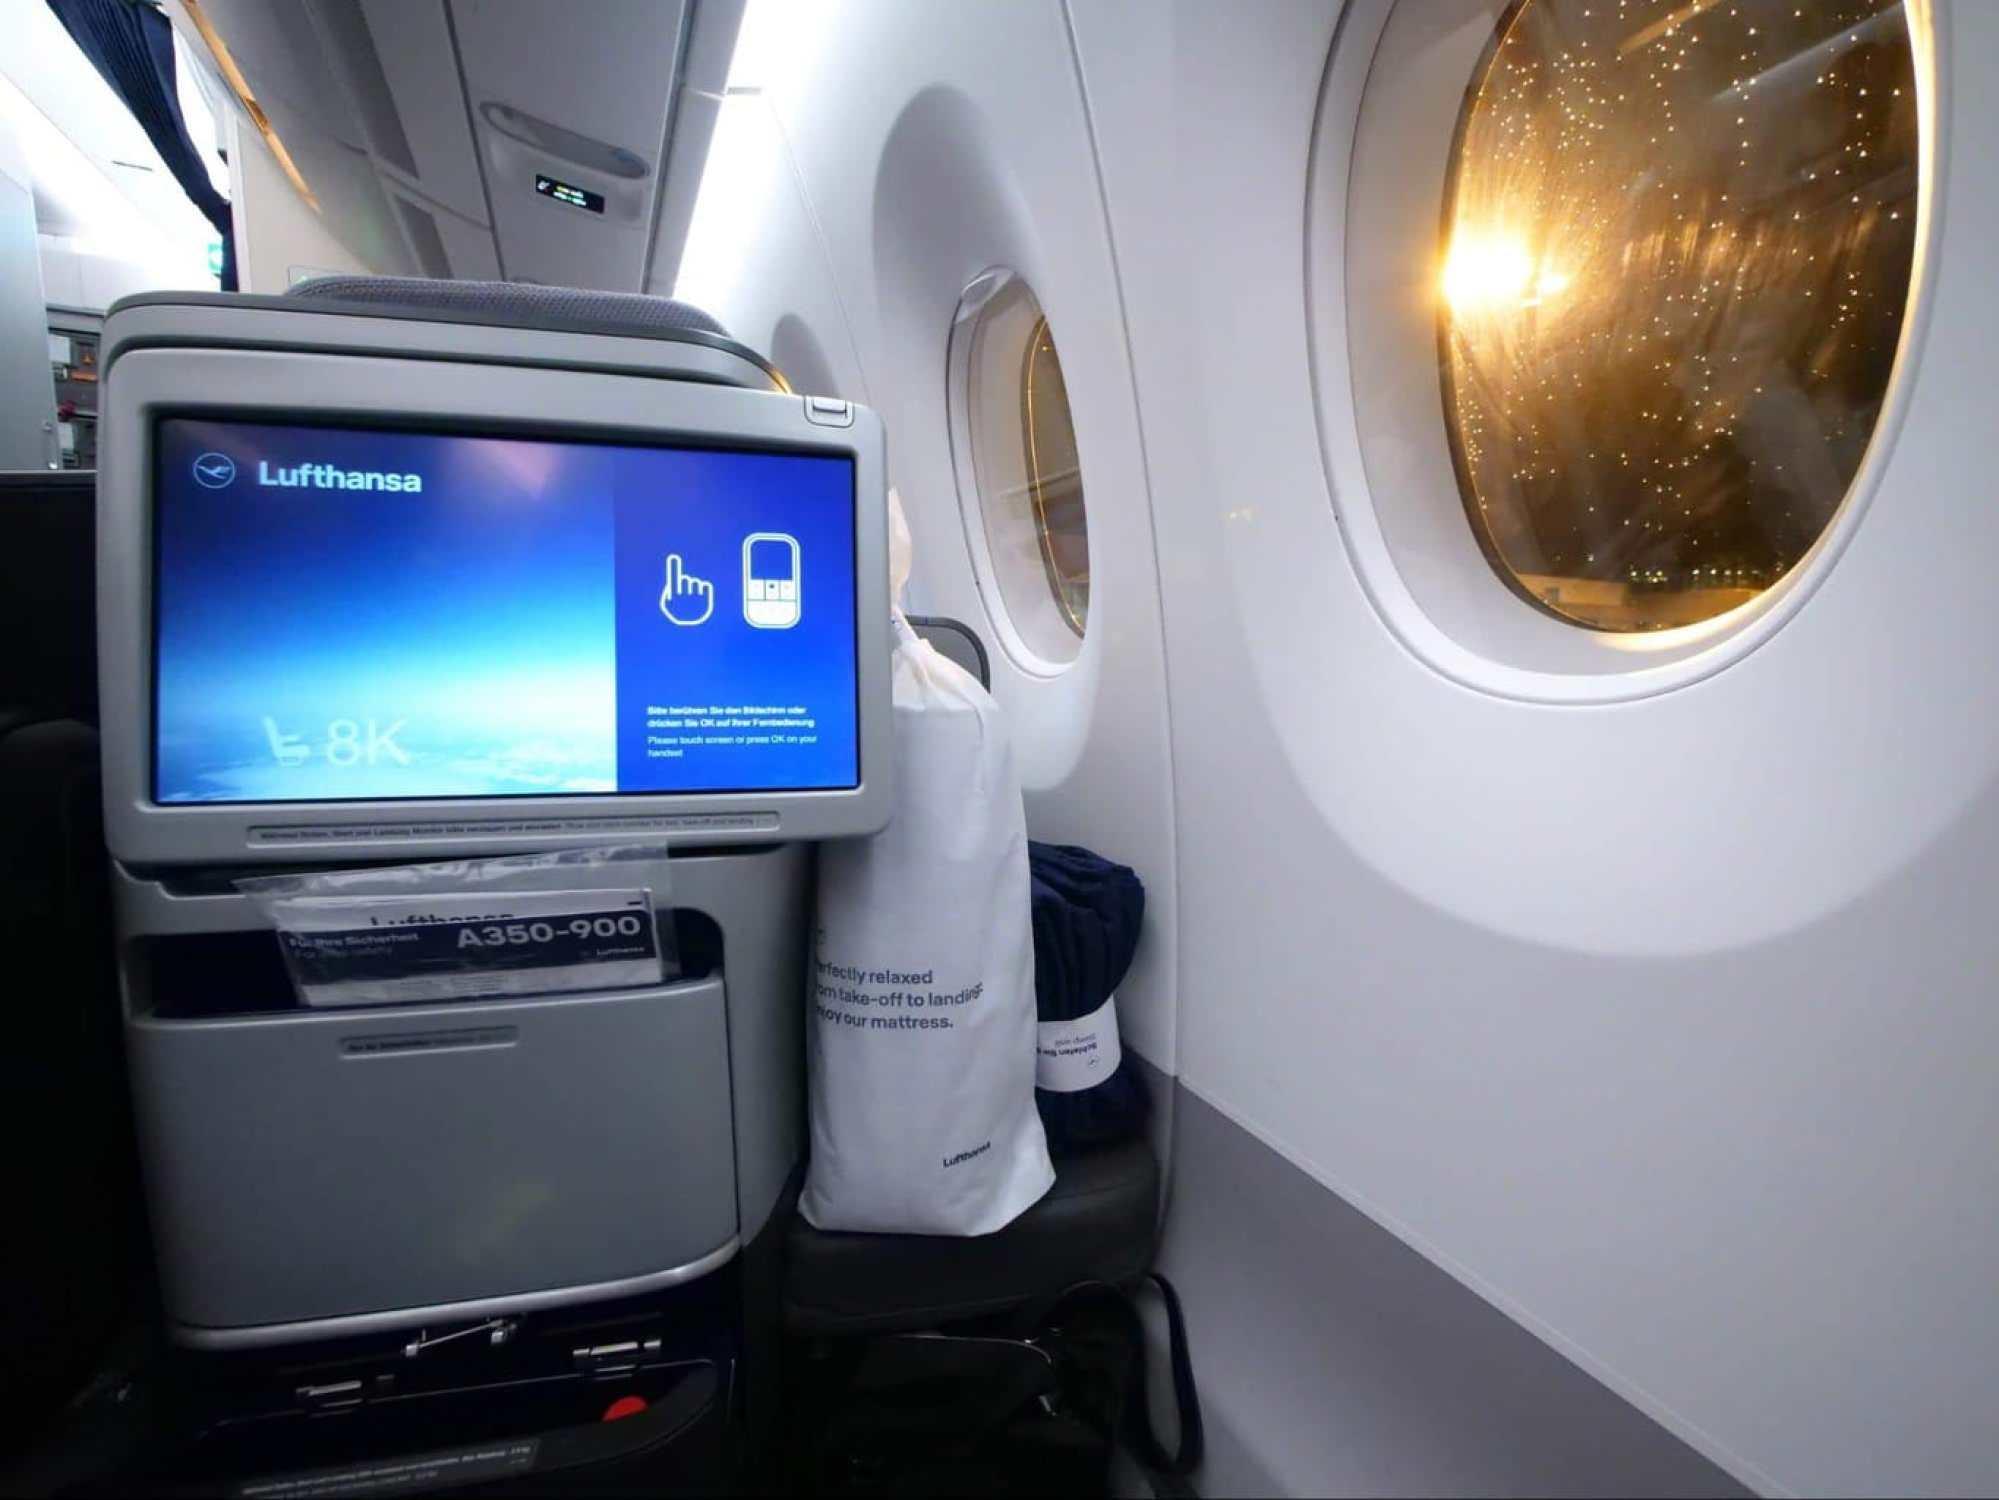 The sliding TV on Lufthansa Business Class